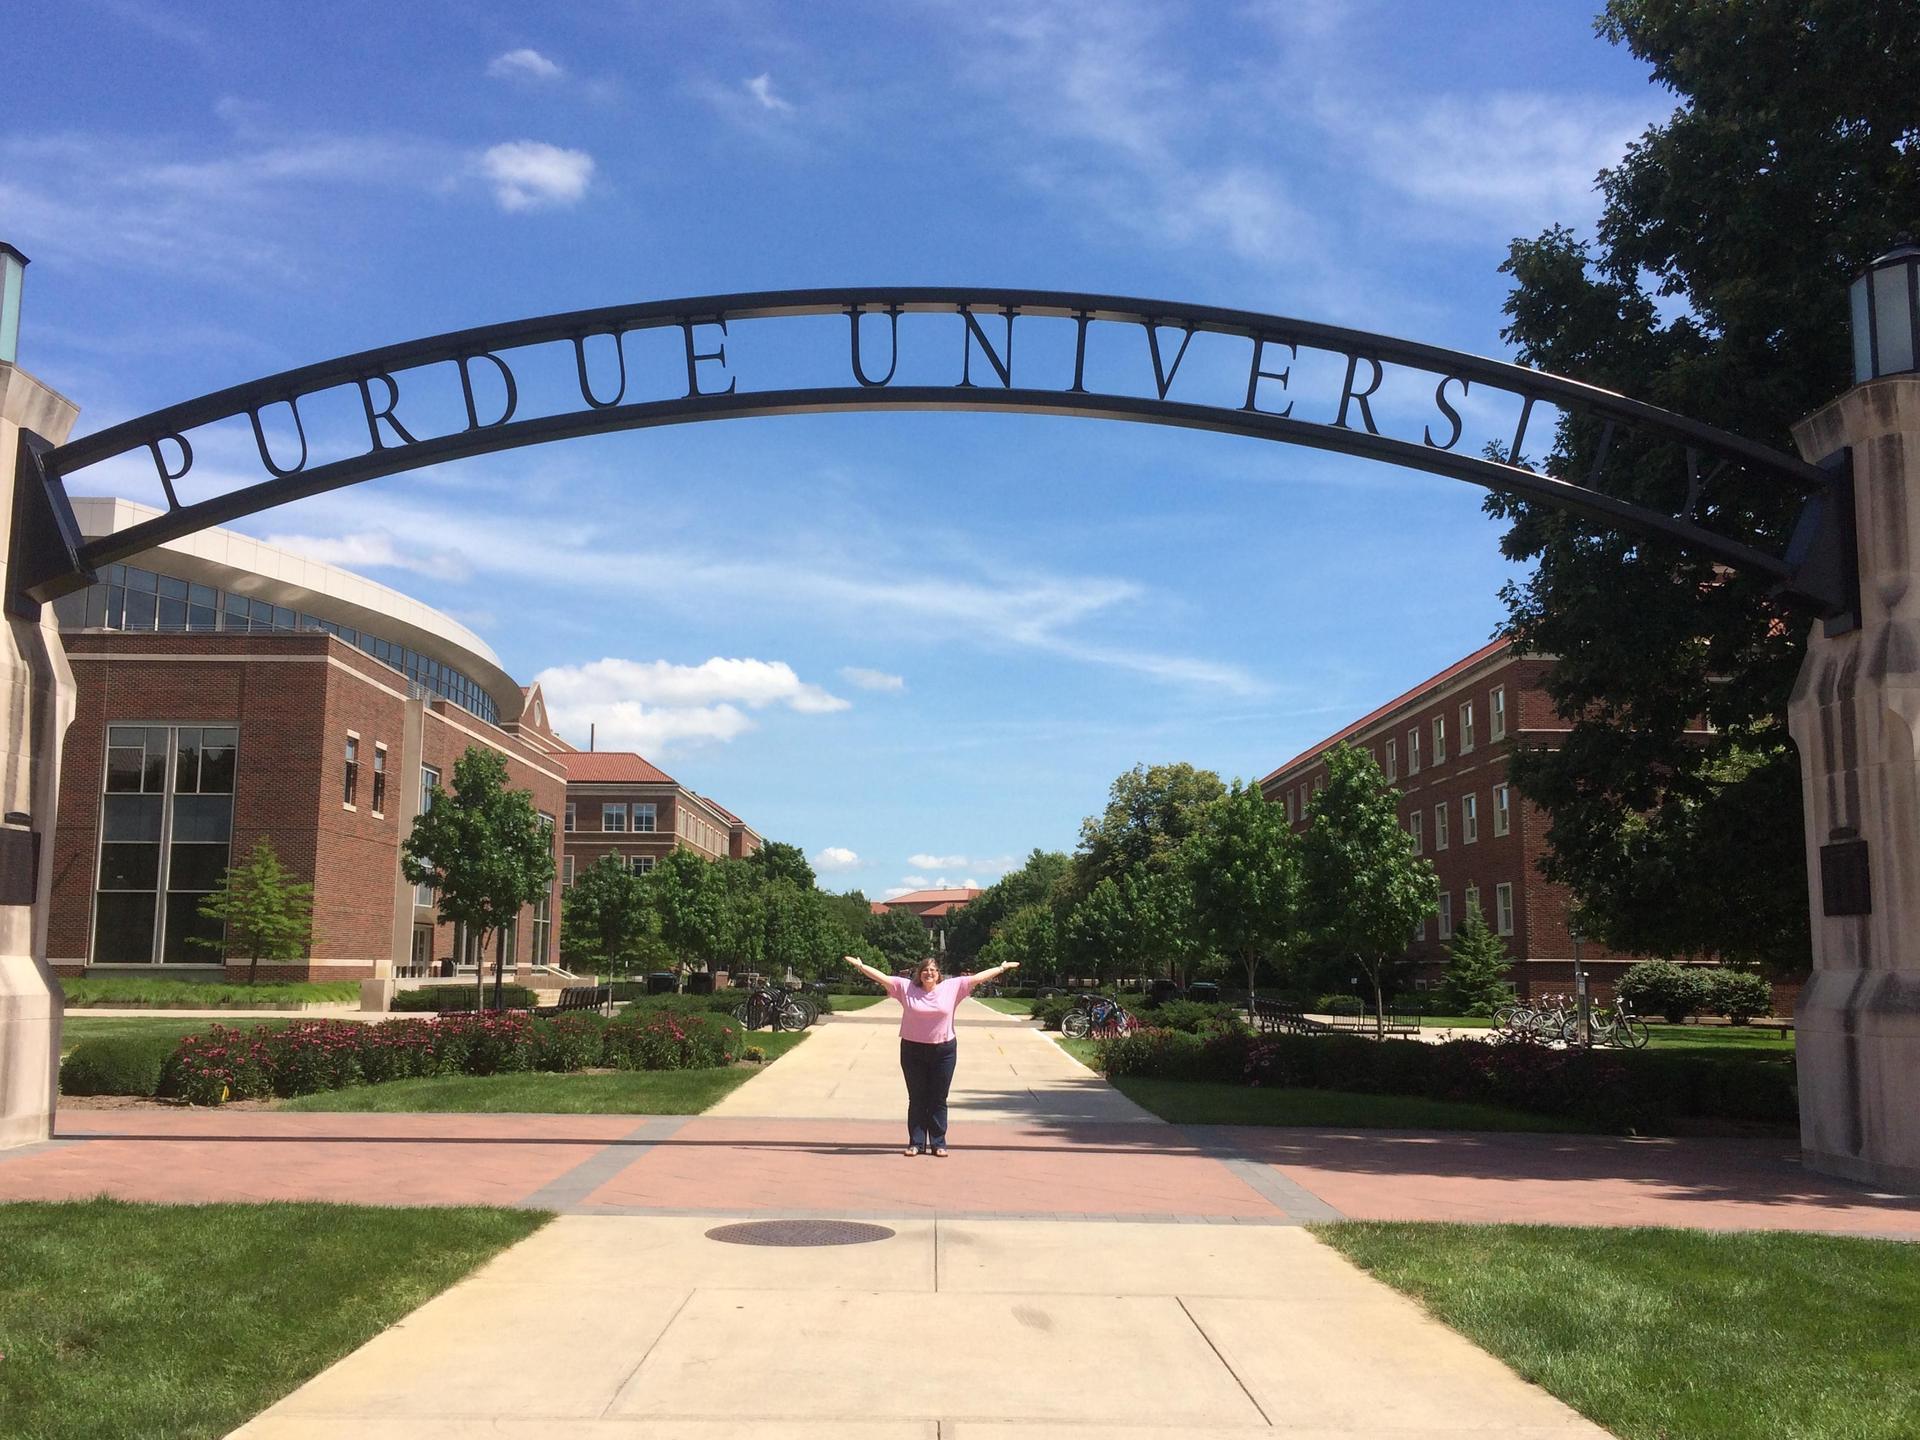 Miss Love at Purdue University